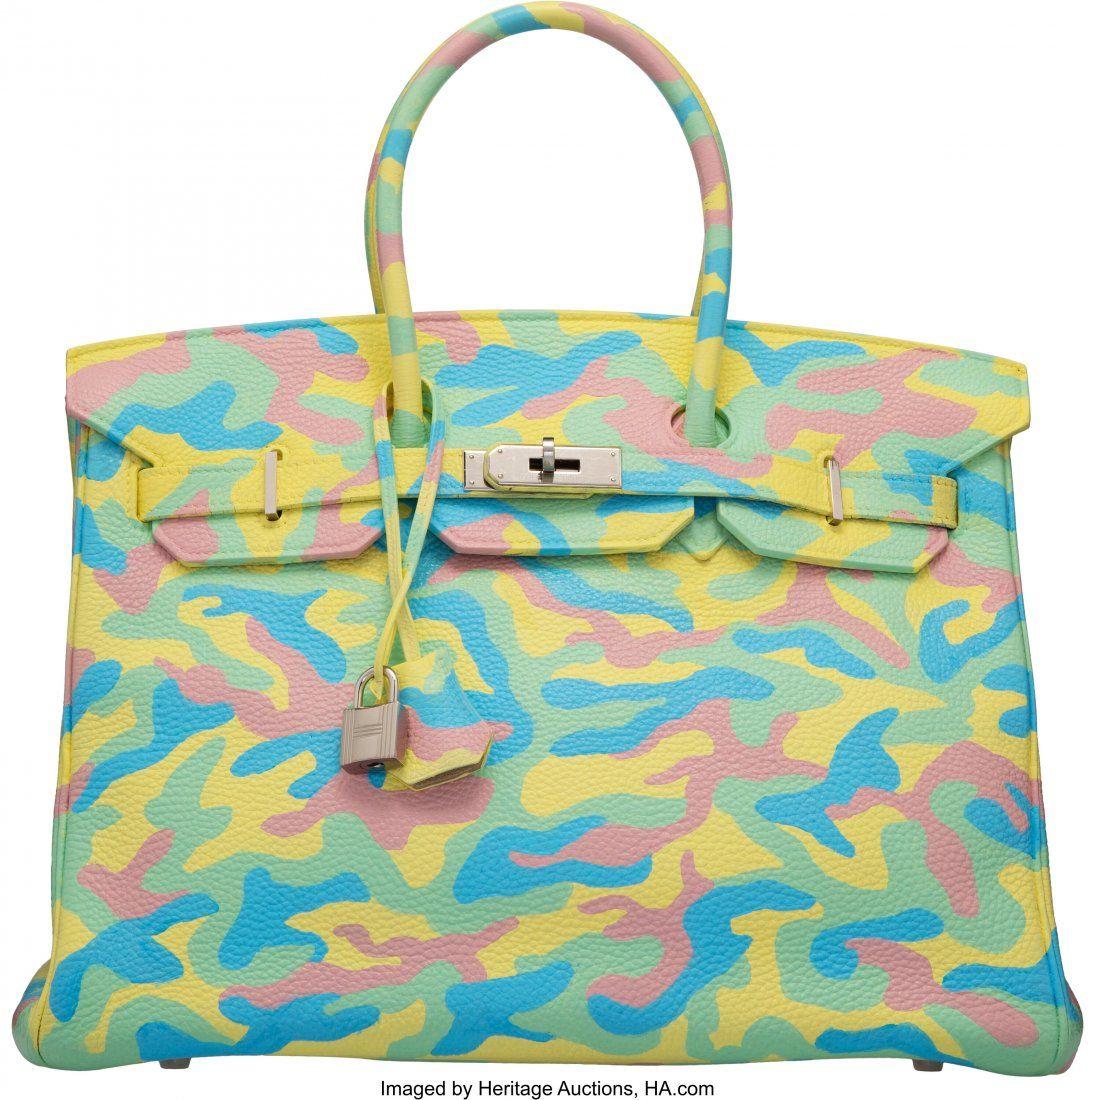 Hermès 35cm Customized Multi-Color Camouflage C